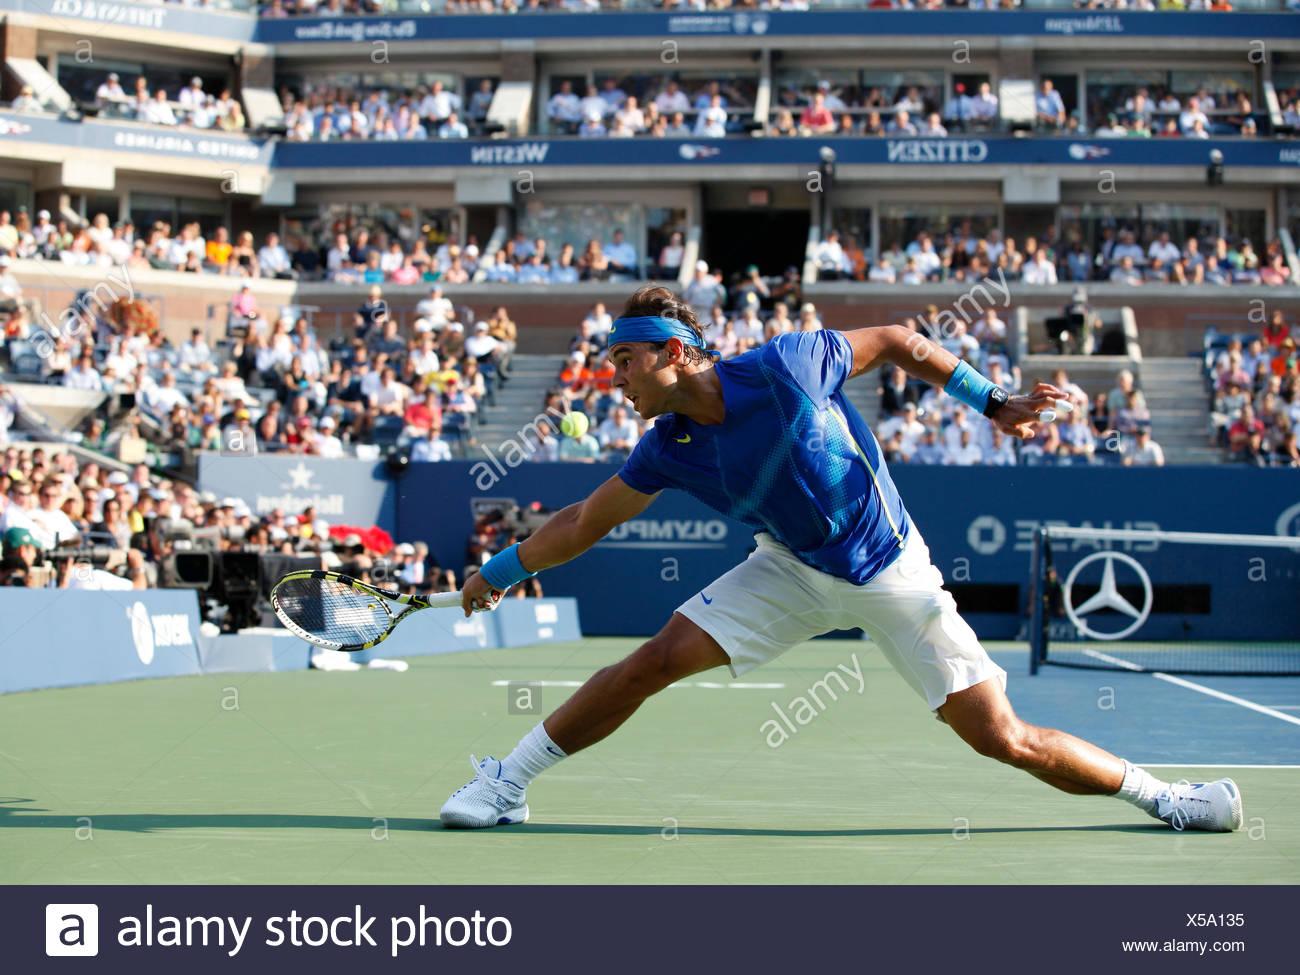 Men's final, Rafael Nadal, ESP, ITF Grand Slam tennis tournament, U.S. Open 2011, USTA Billie Jean King National Tennis Center - Stock Image